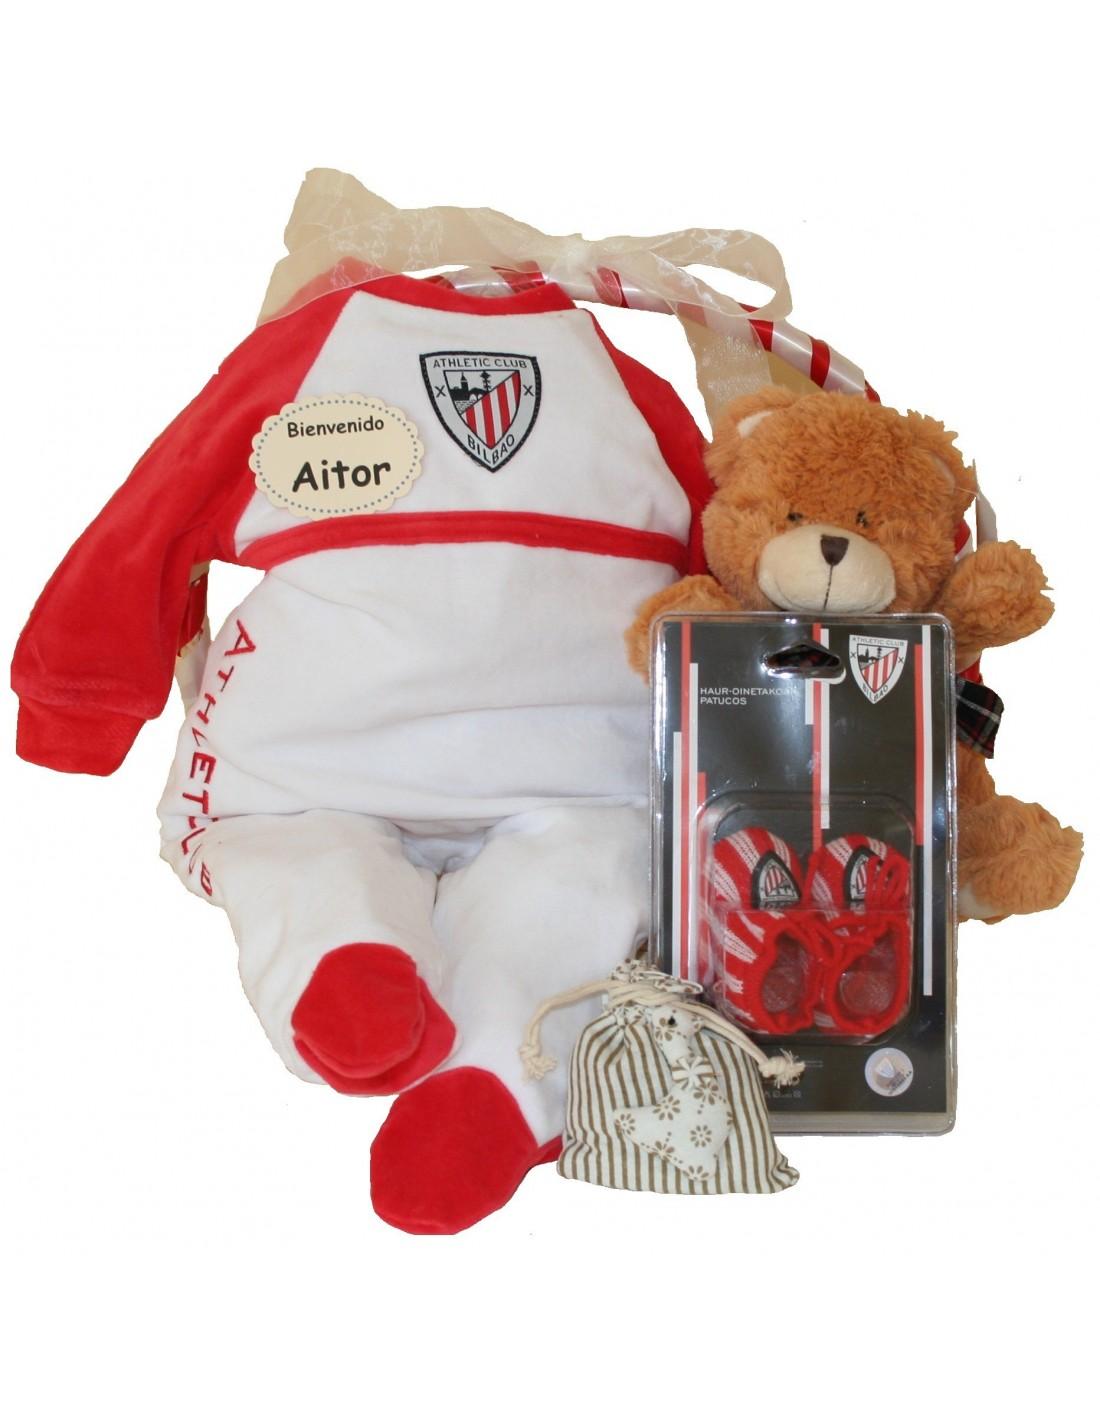 Comprar Canastilla Athletic Club Bilbao. online - Cestitas. Comprar  Canastilla. Canastilla bebé Athletic de Bilbao 84335f59fe9cc